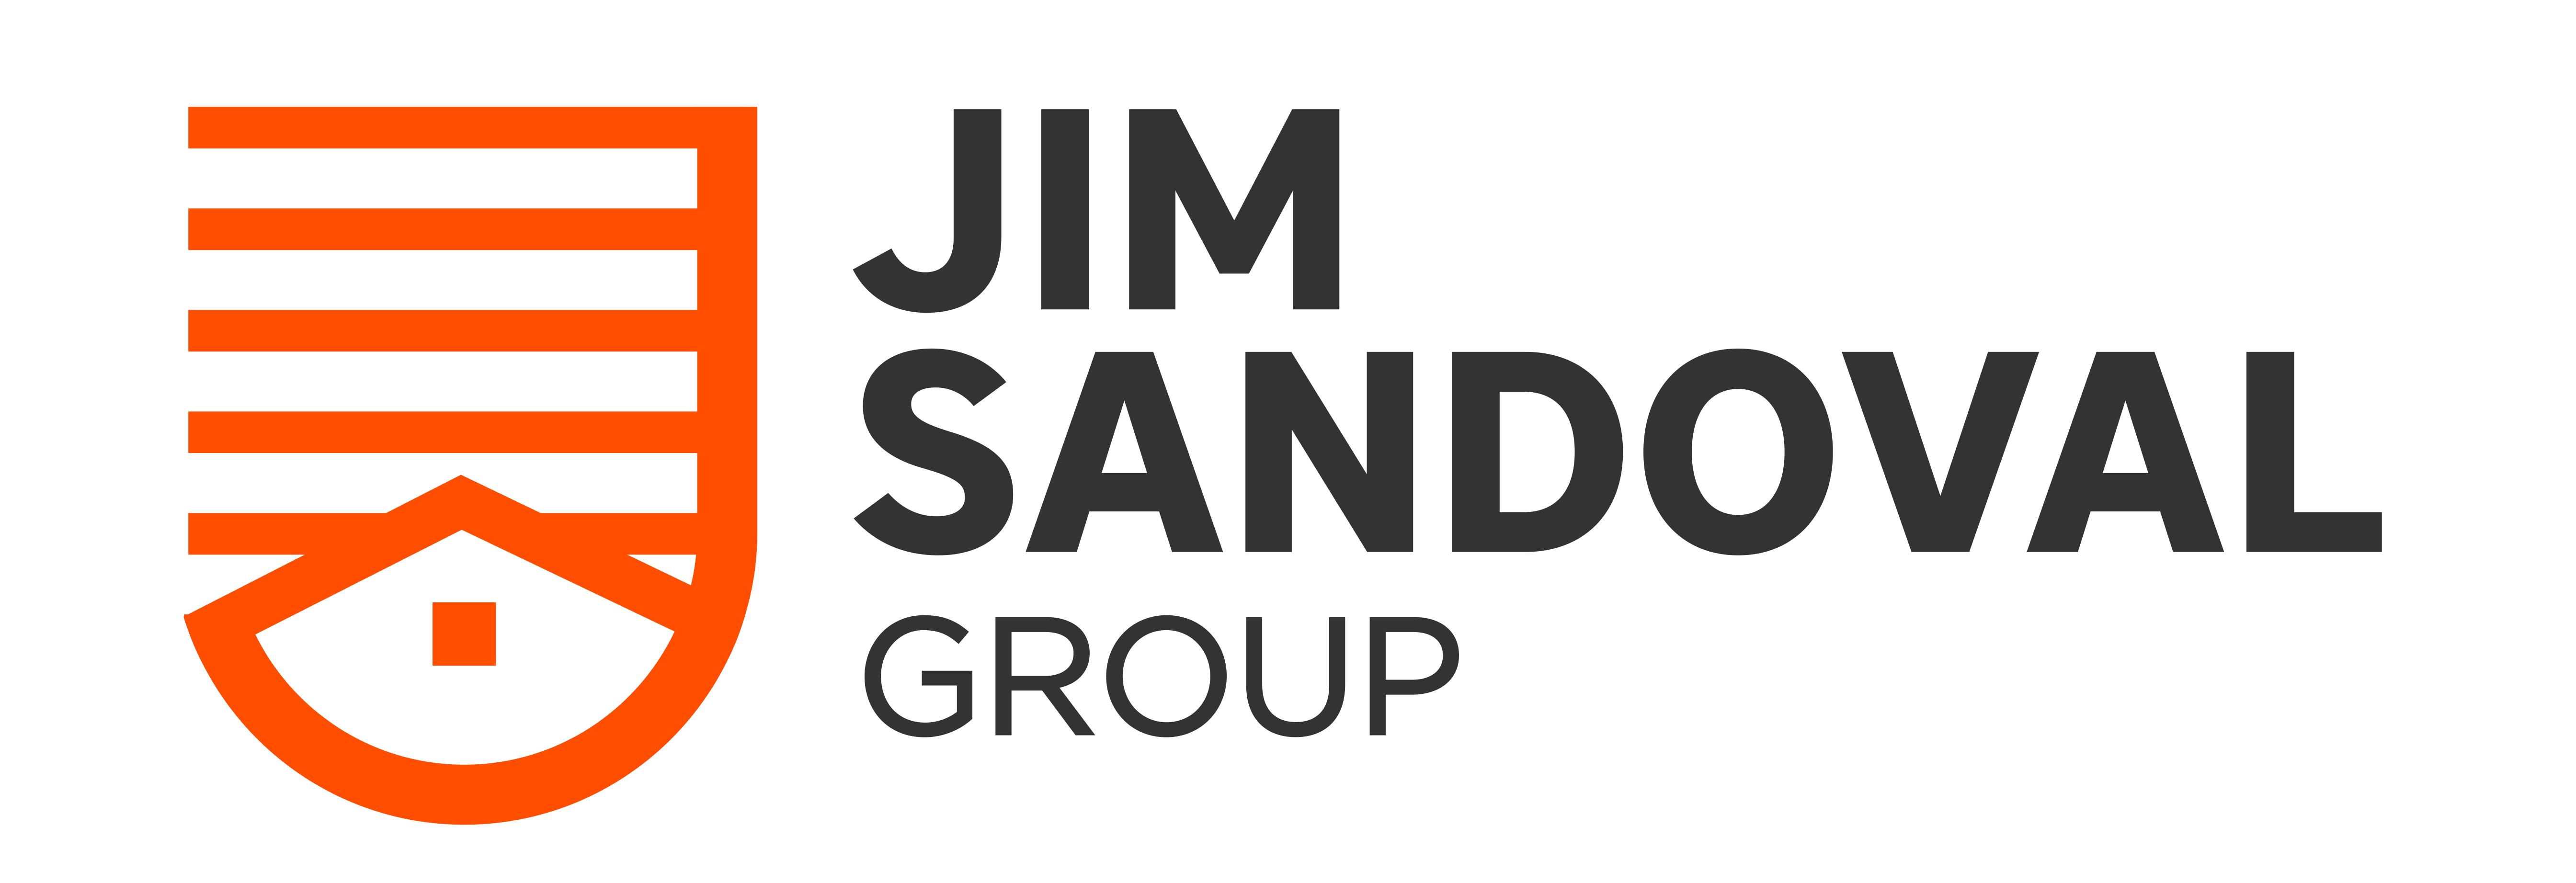 Jim Sandoval Group logo